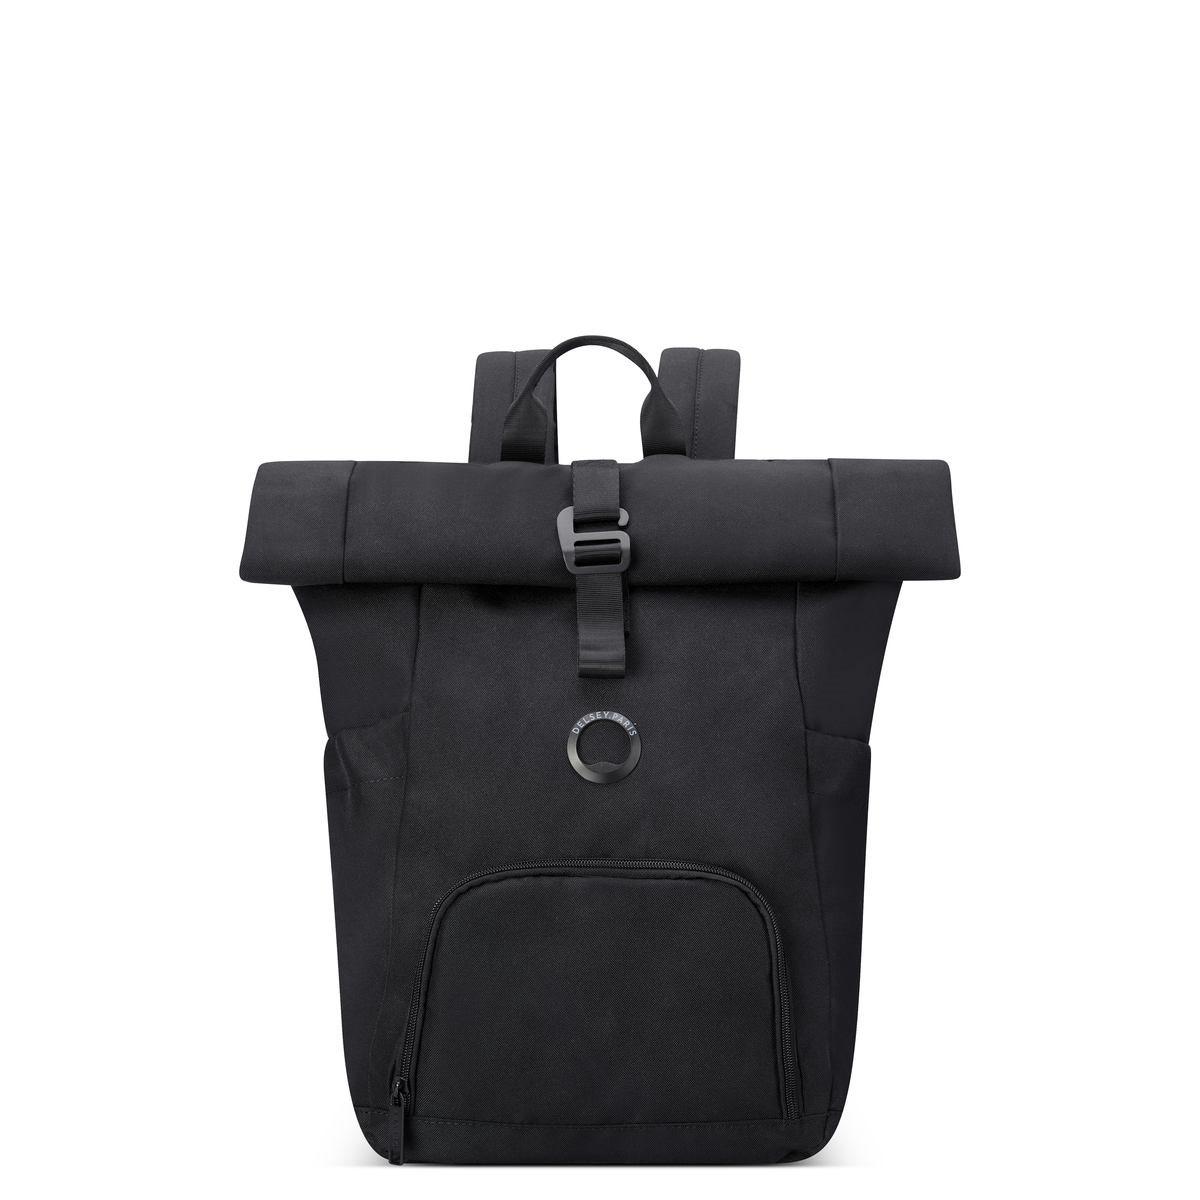 Delsey Σακίδιο πλάτης recycled 43.5x37.5x13.5cm για PC 15.6   σειρά Citypack Black